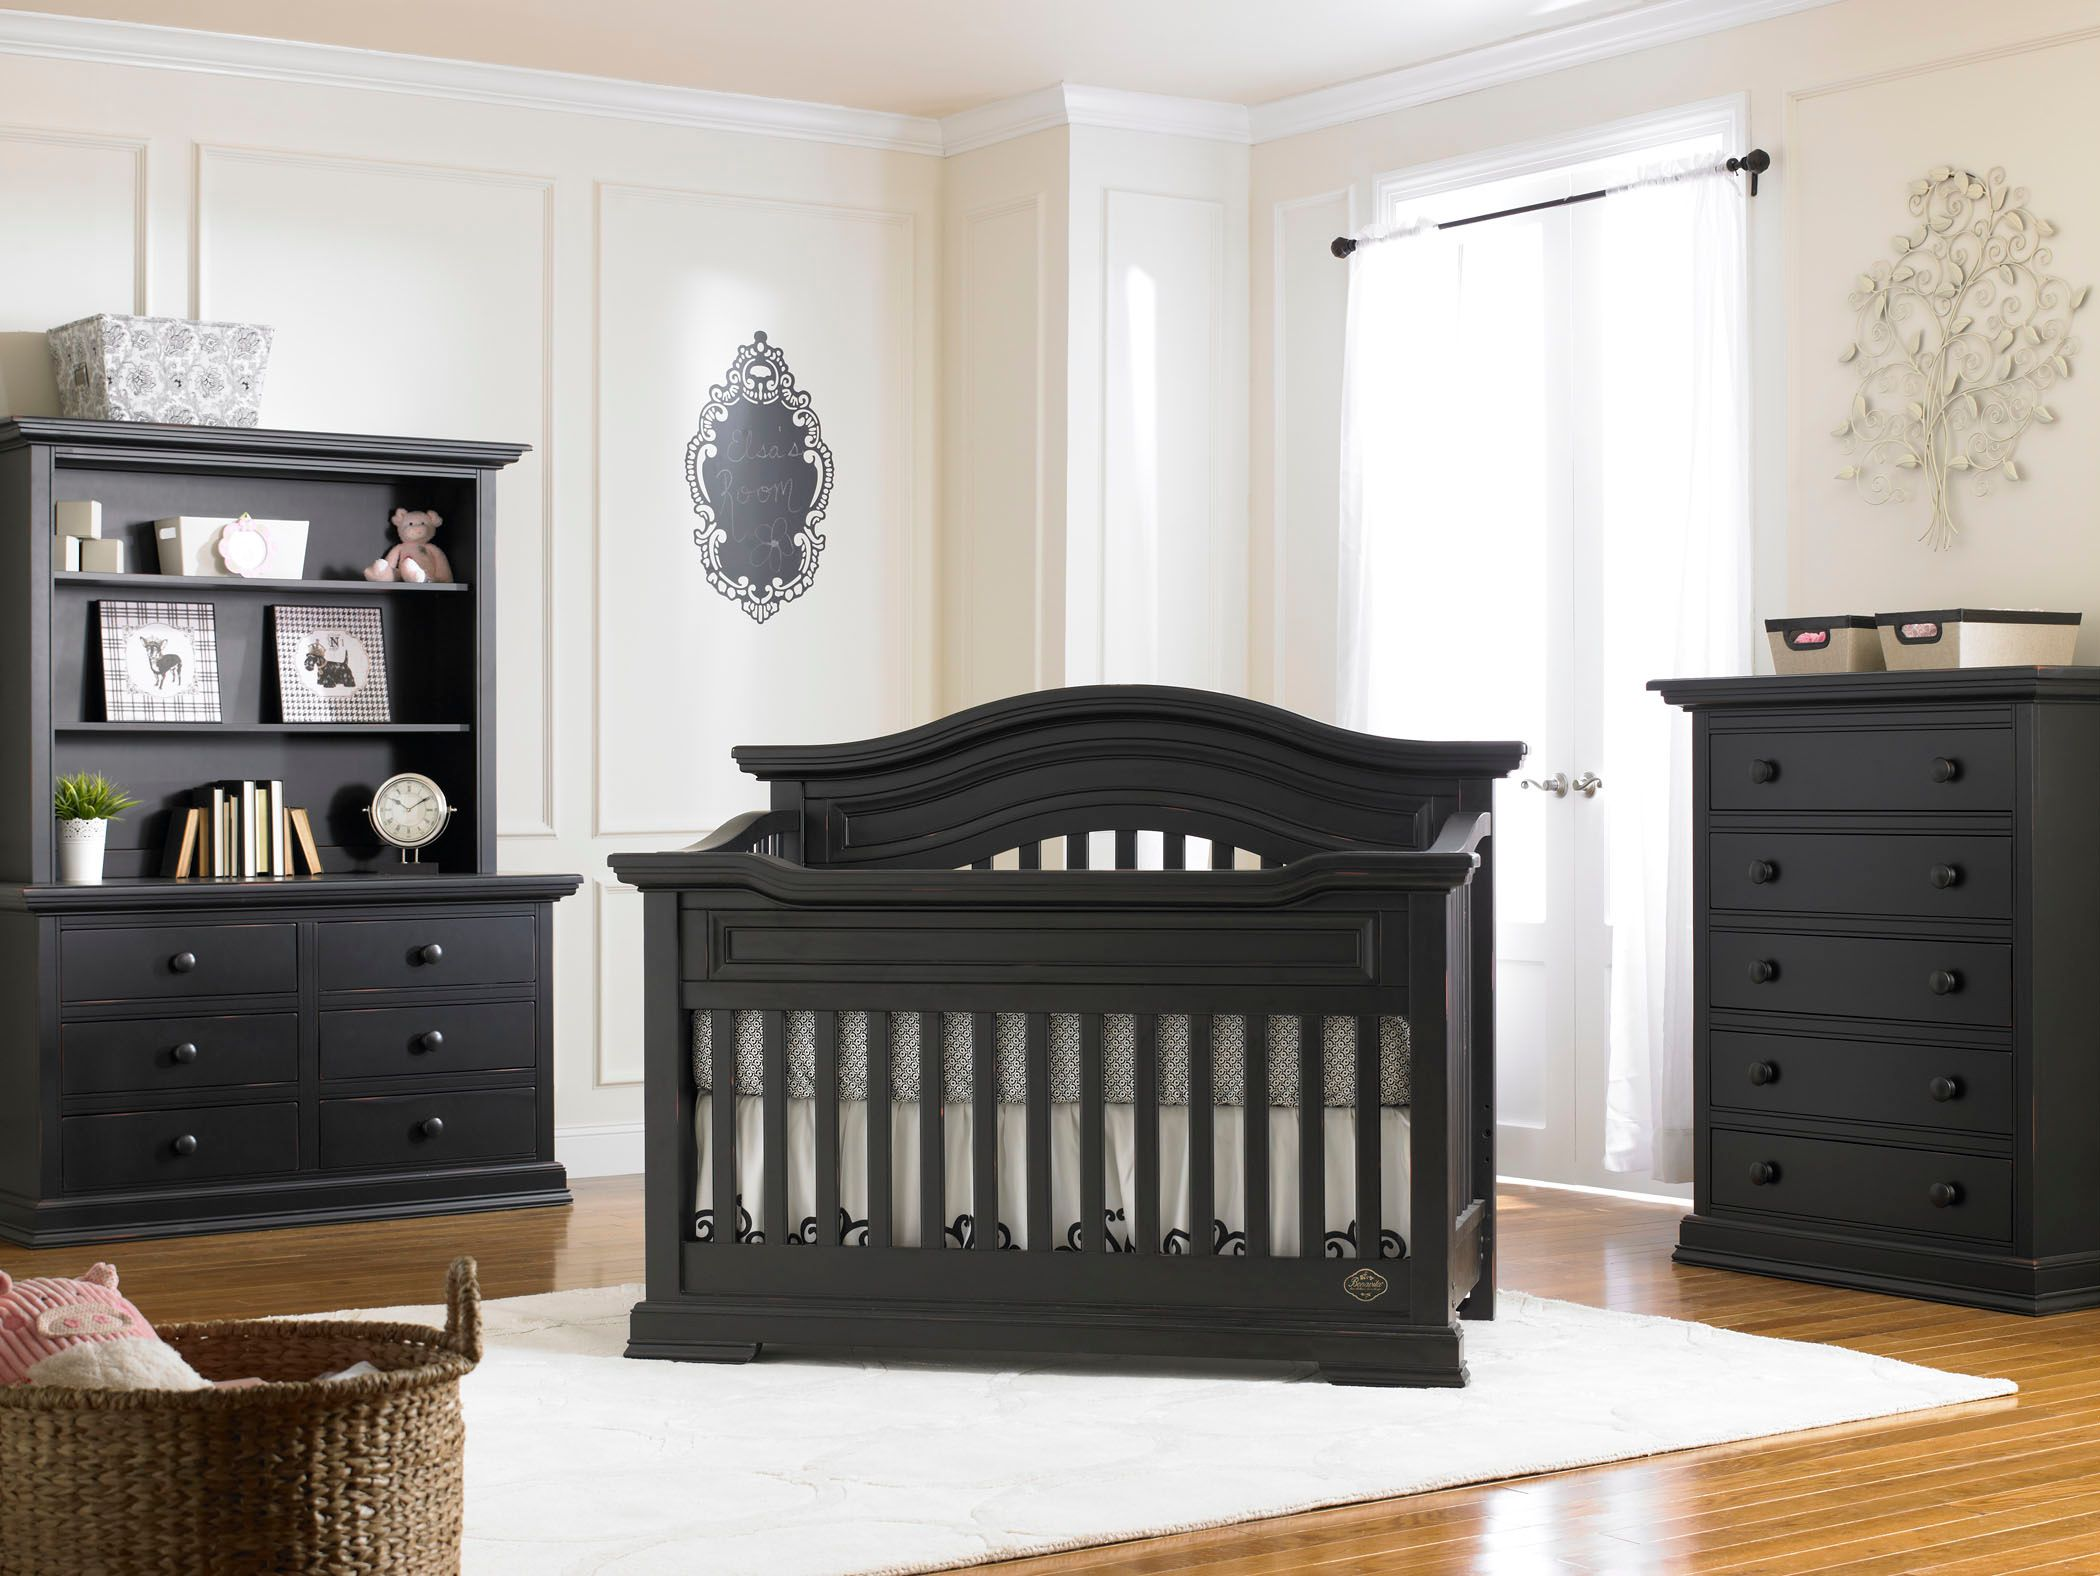 Belmont Lifestyle Crib From Bonavita Collection Will Revolutionize